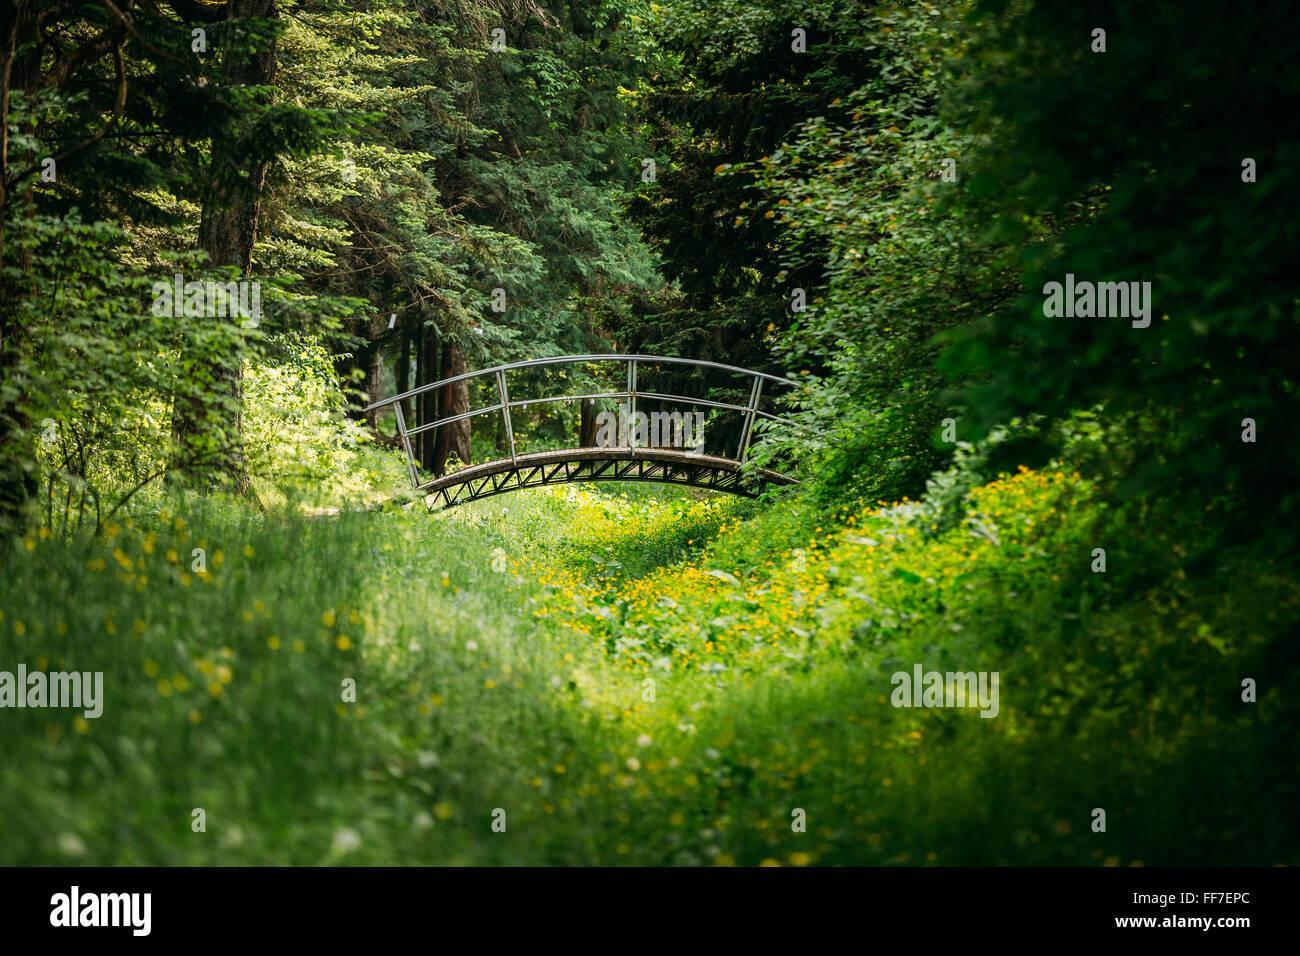 Old small decorative bridge in summer garden park forest Stock Photo ...